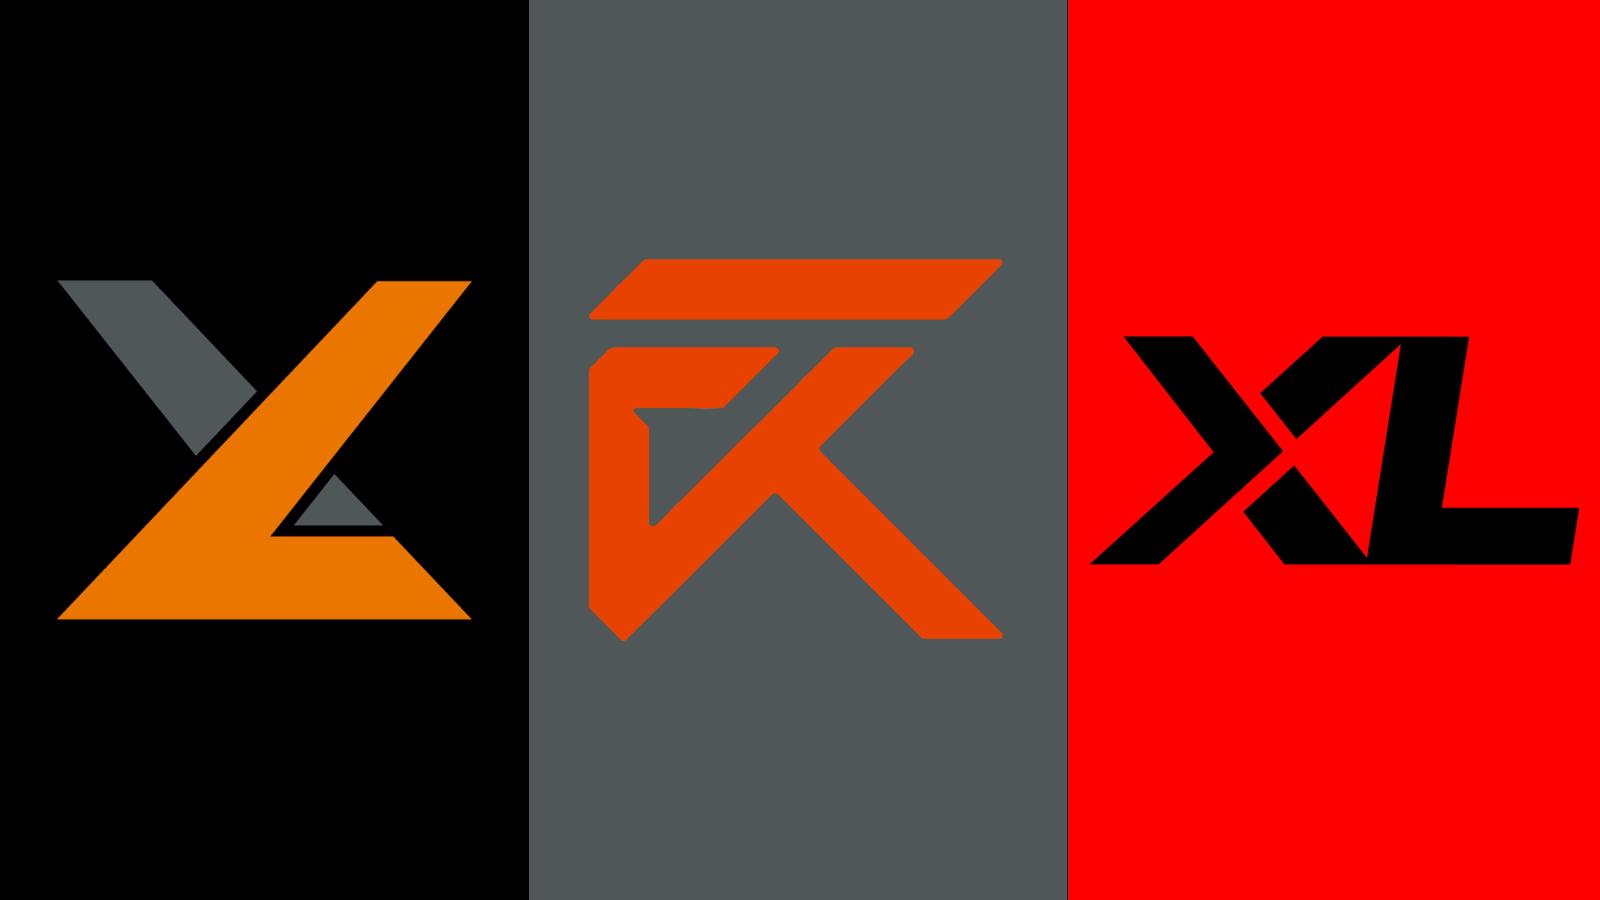 EXCEL ESPORTS Rebrand